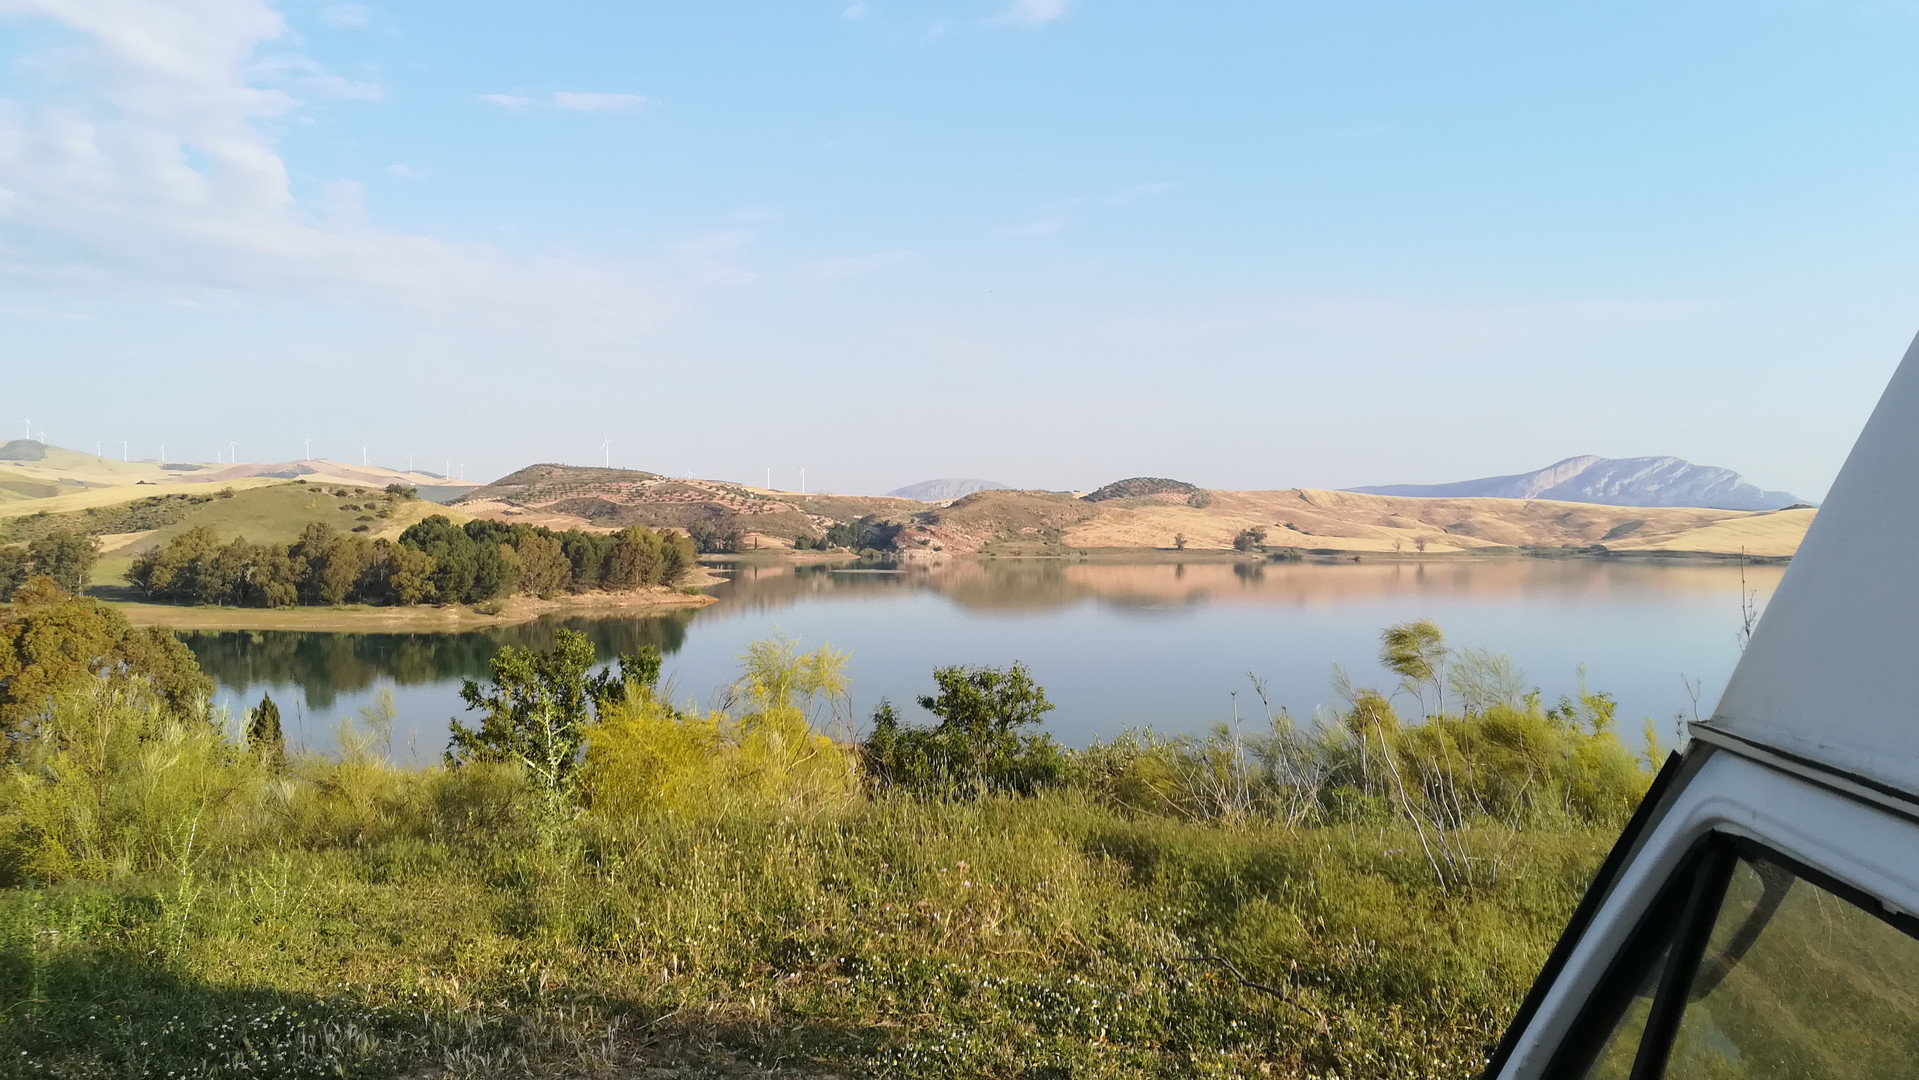 Wild camping in El Chorro